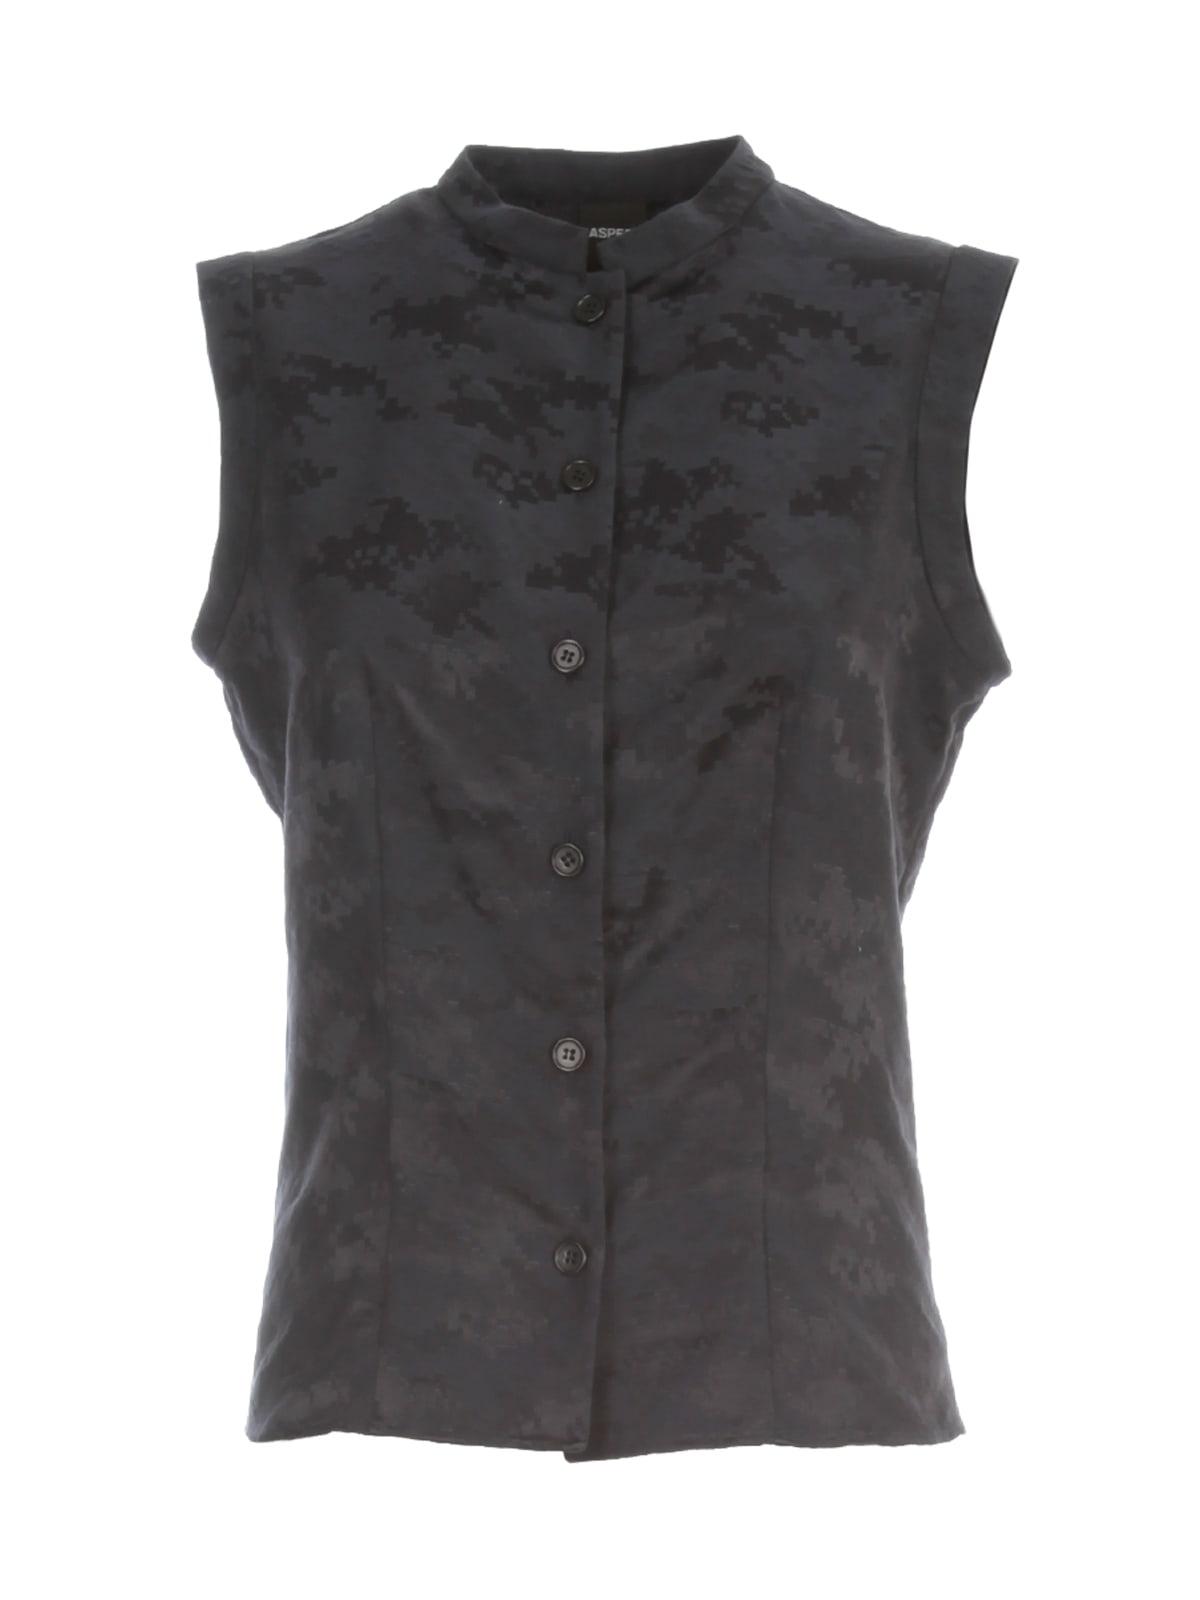 Aspesi Jacquard Sleeveless Shirt In Navy